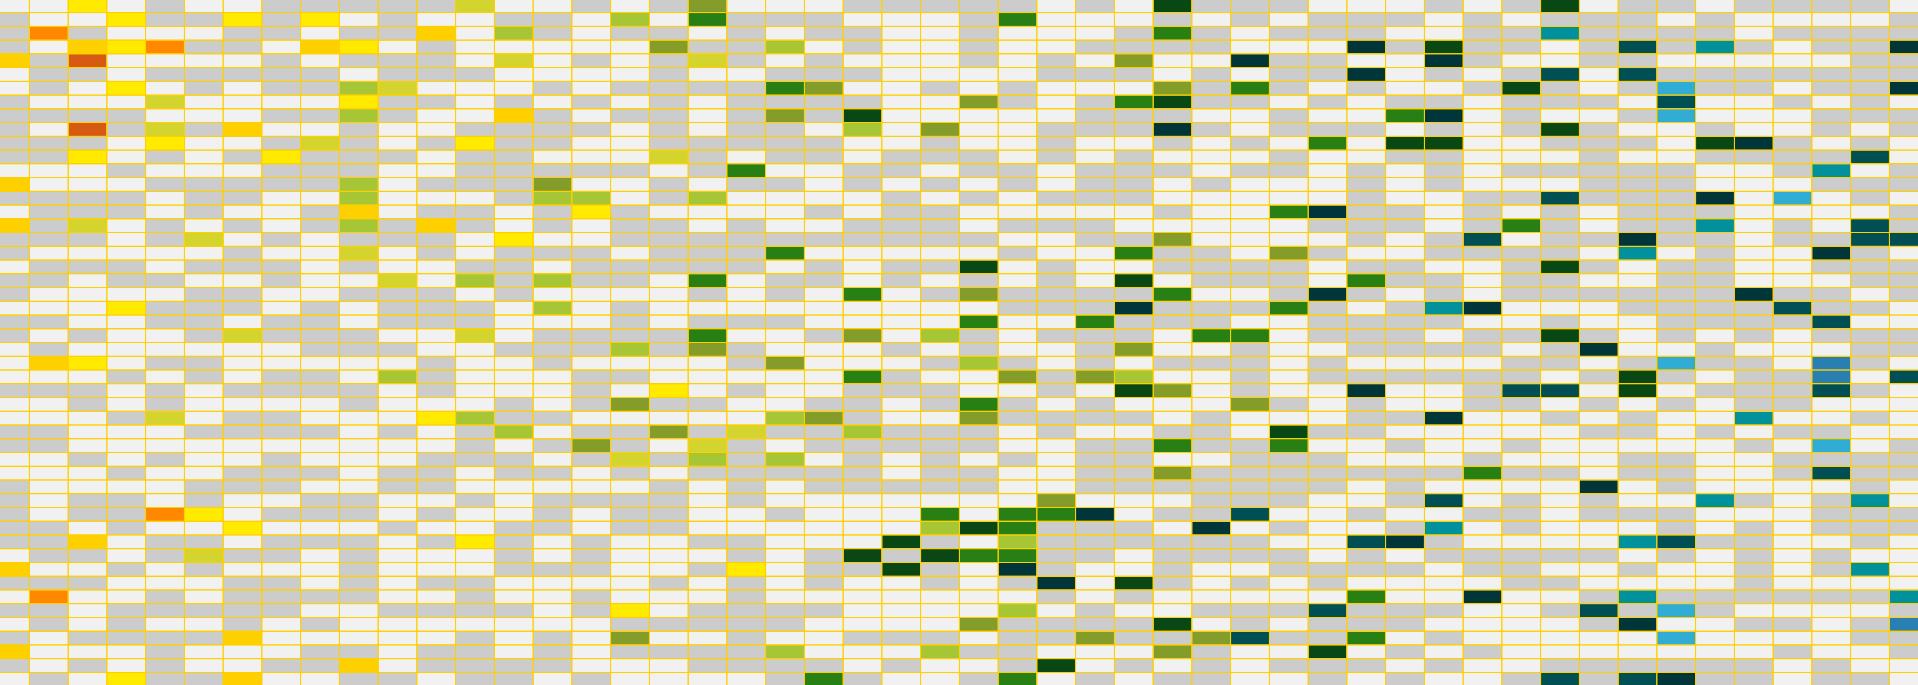 gene1.PNG